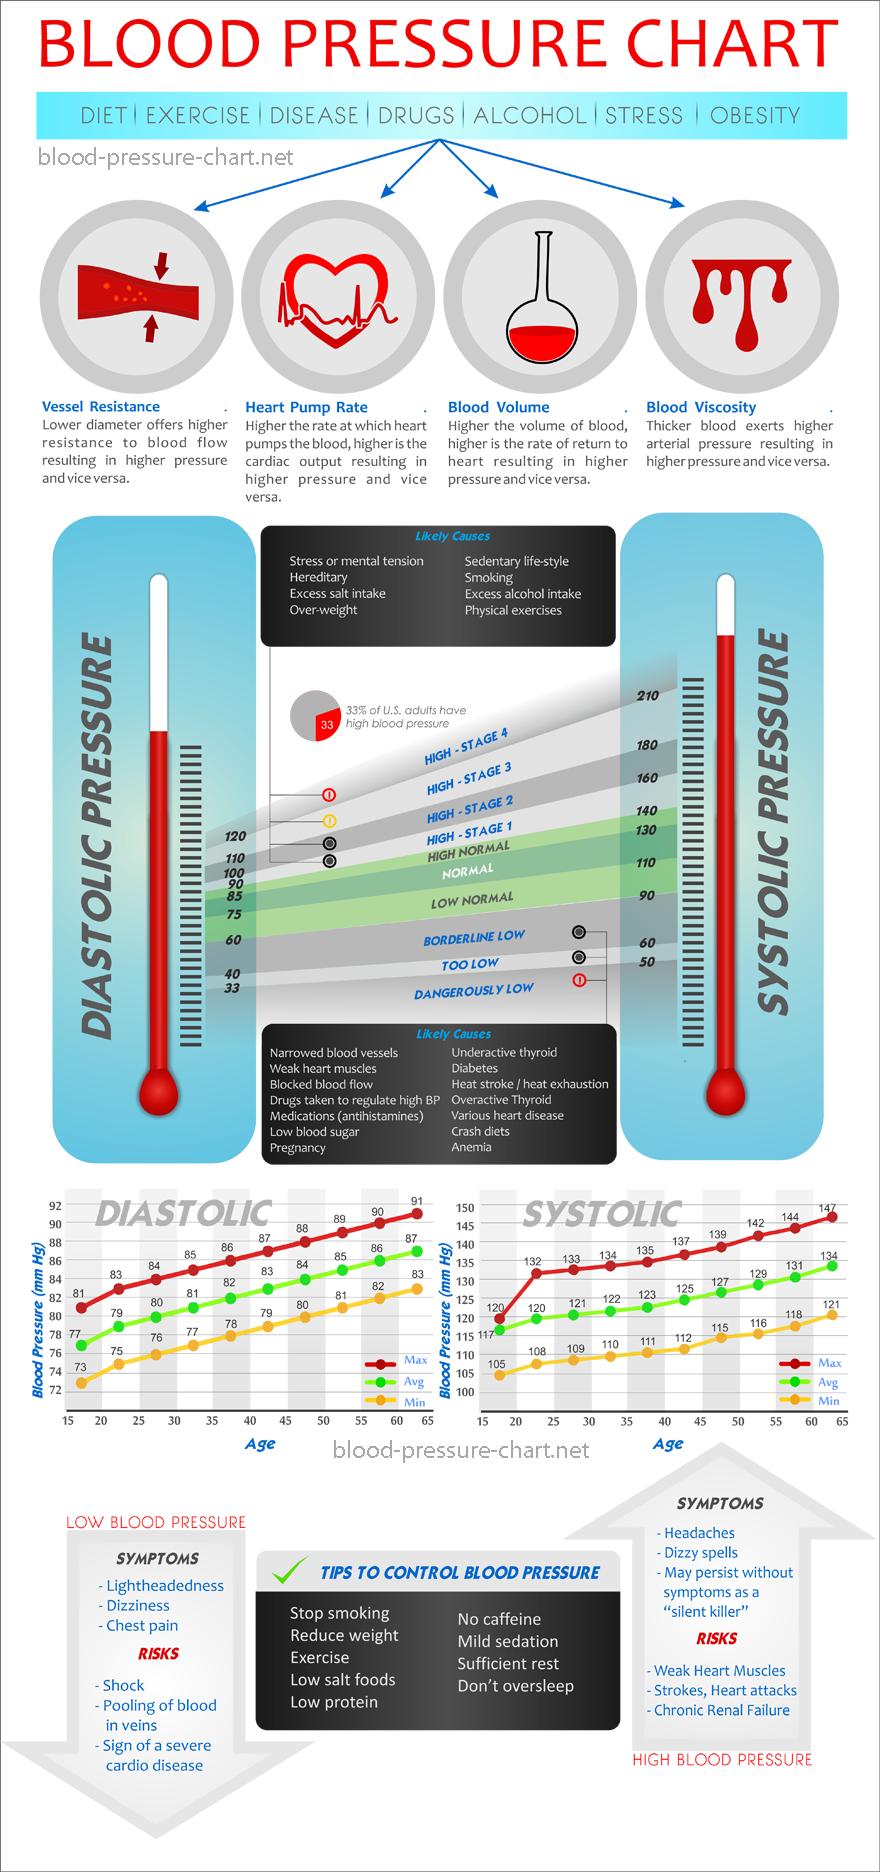 High blood pressure blood pressure chart blood pressure and charts blood pressure chart bloodpressure health inhealth inhealth nvjuhfo Image collections